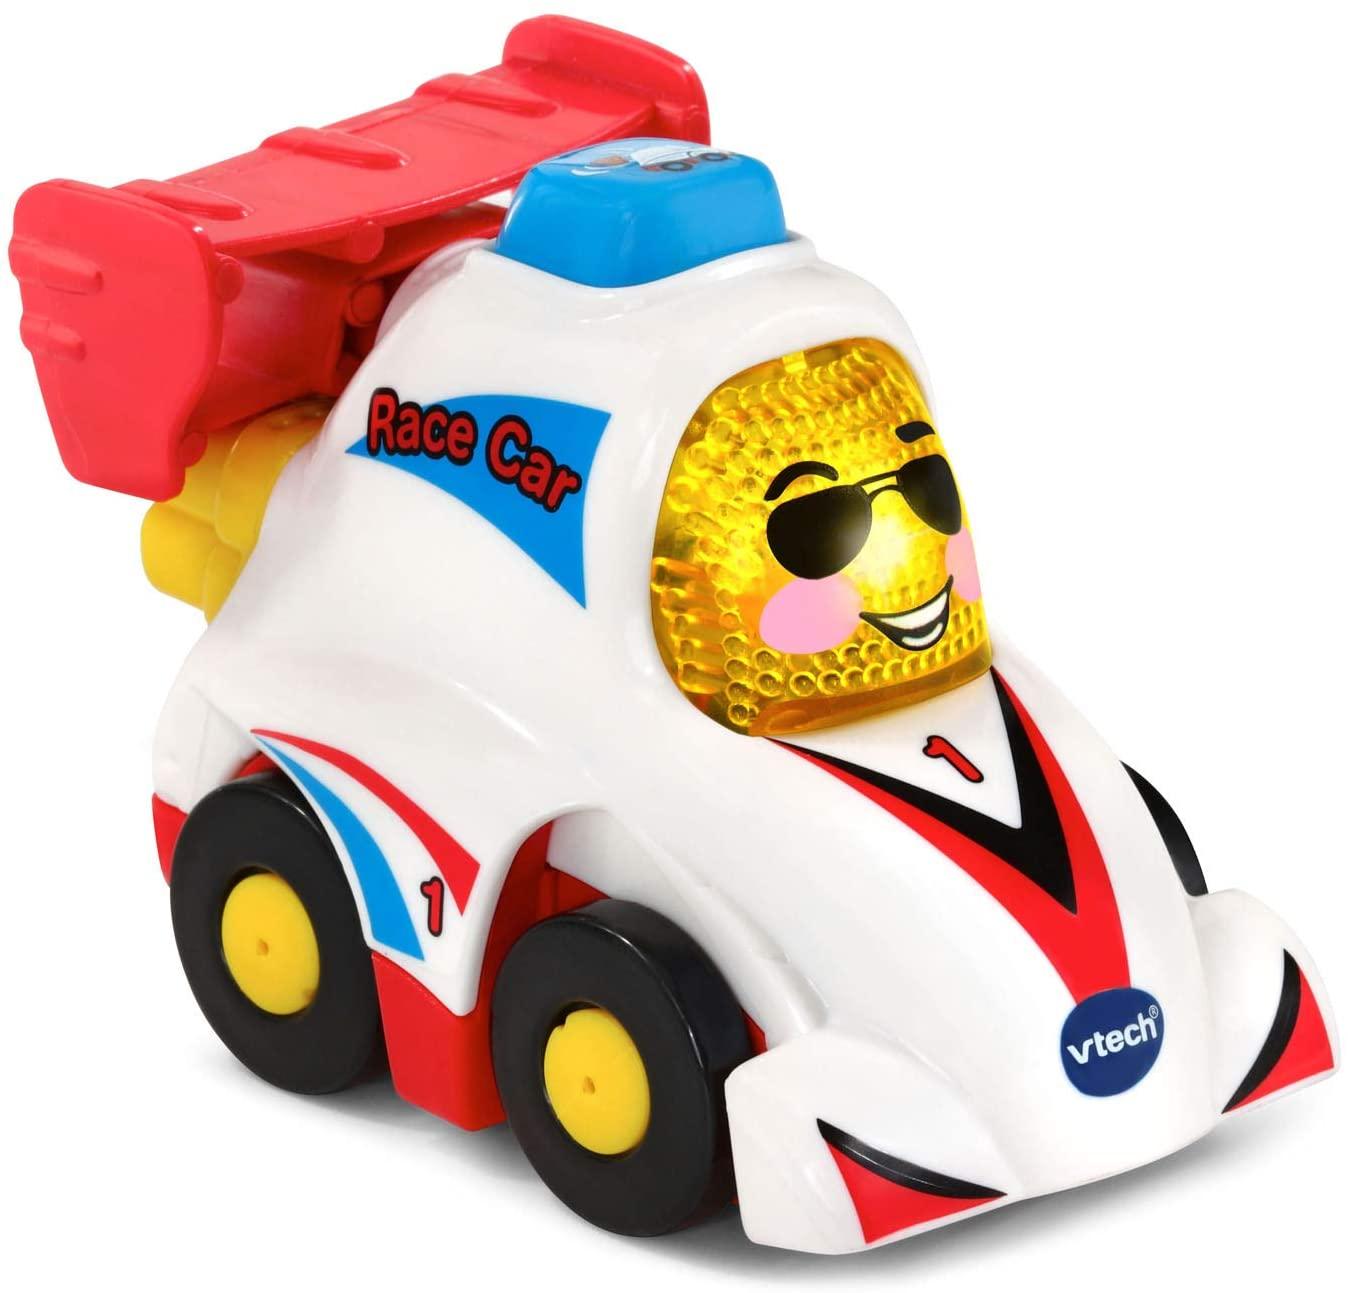 stocking-stuffer-ideas-for-kids-race-car